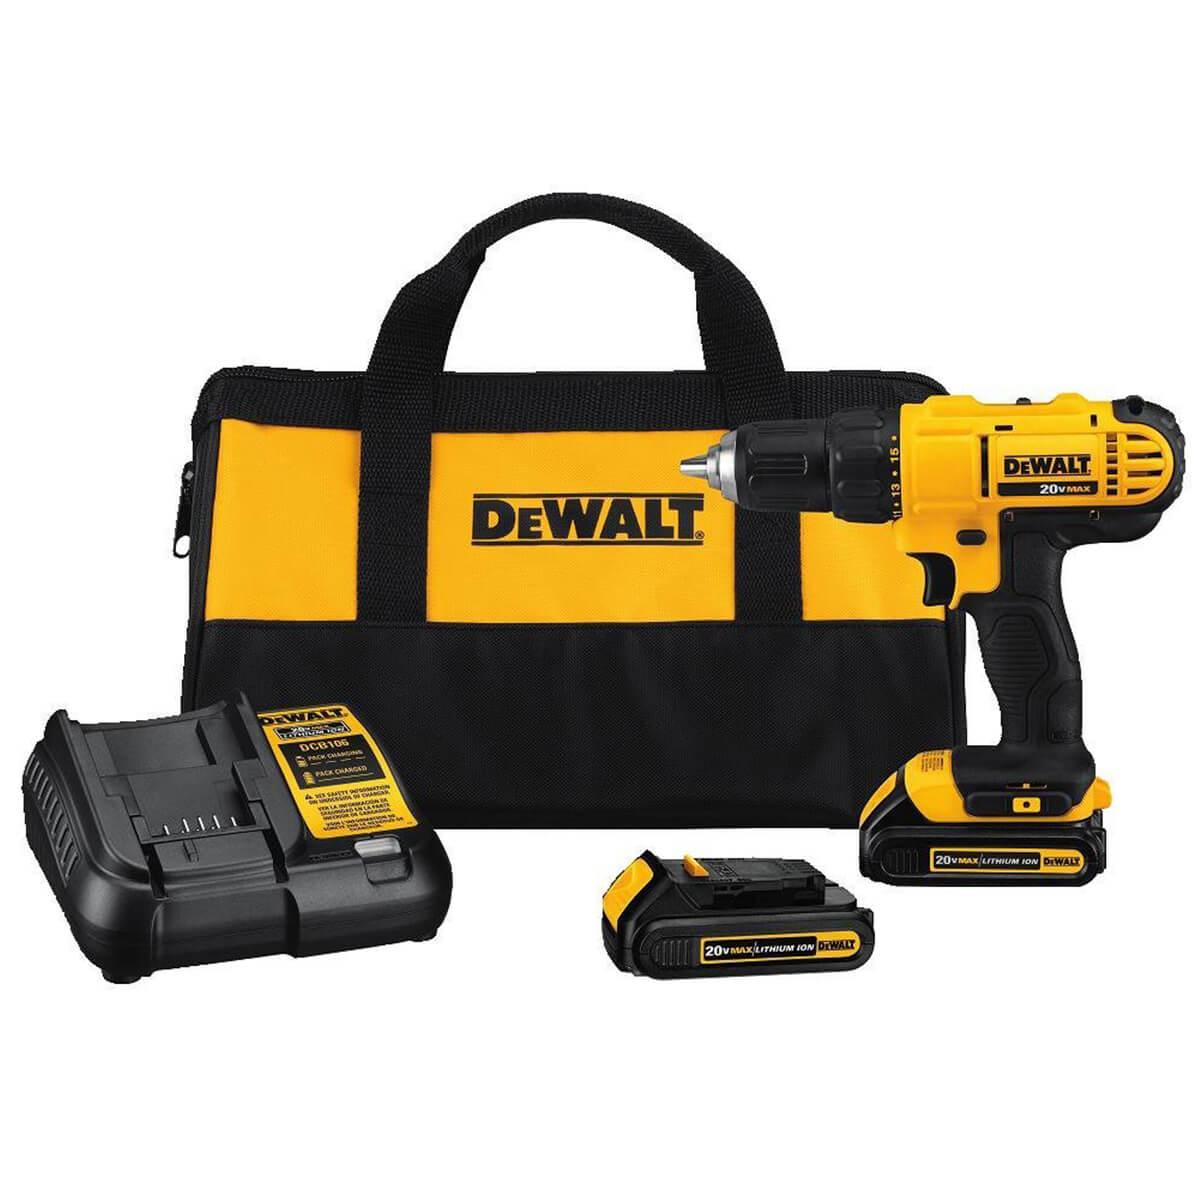 DEWALT 20V Max* Compact Brushless Drill / Driver